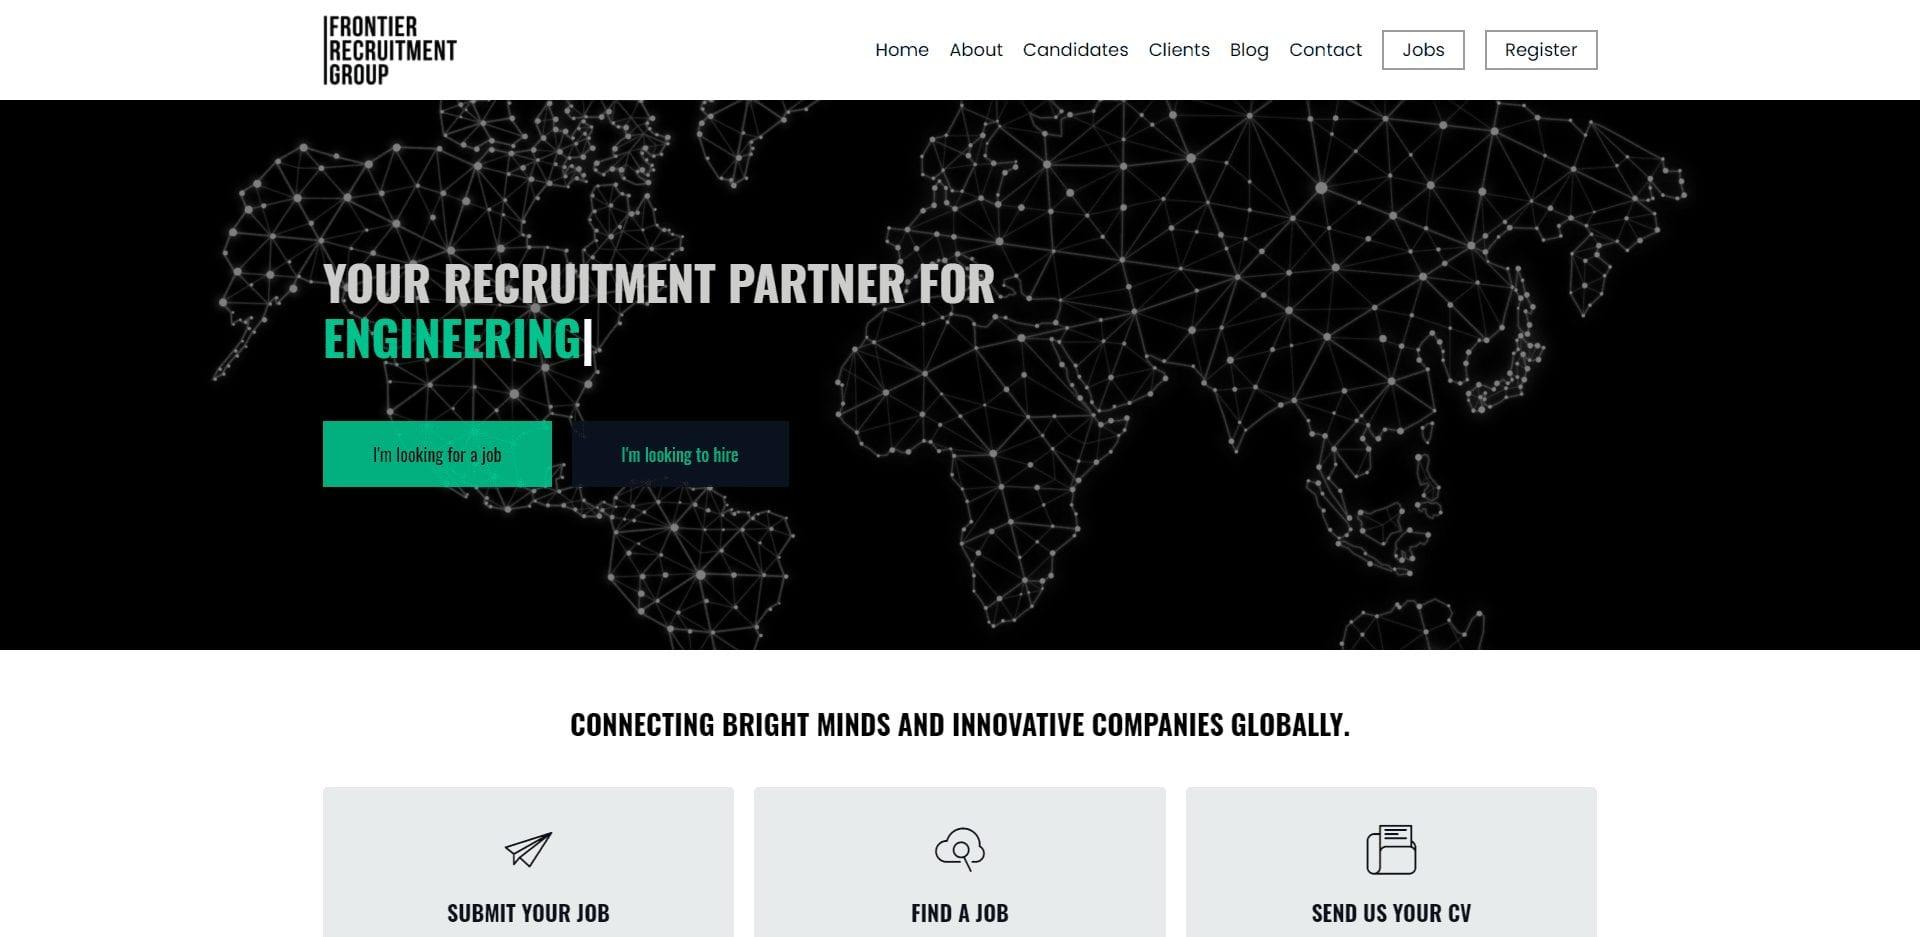 Frontier Recruitment Group